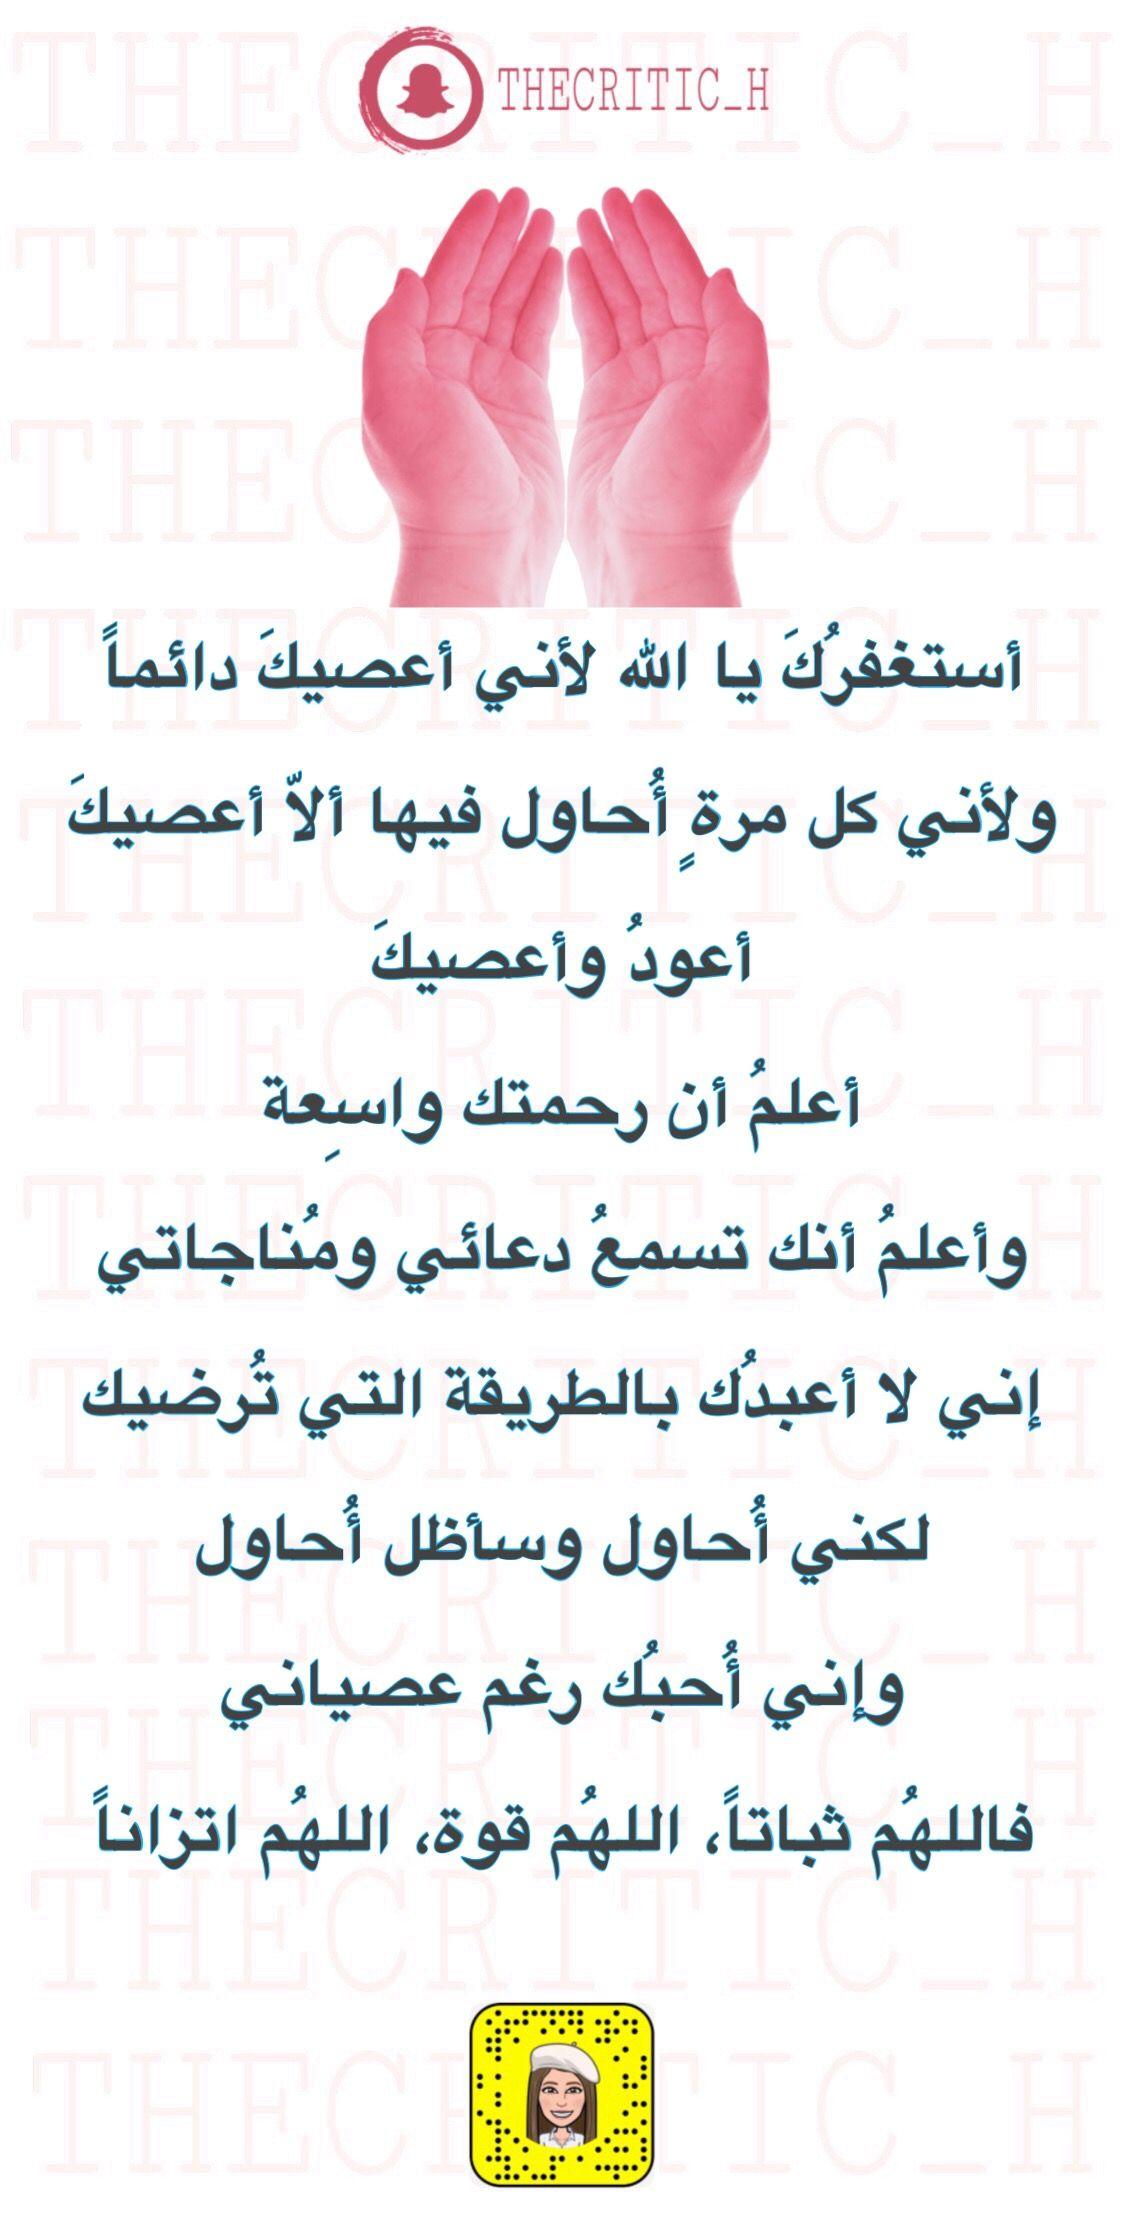 استغفرك يالله Duaa Islam Islam